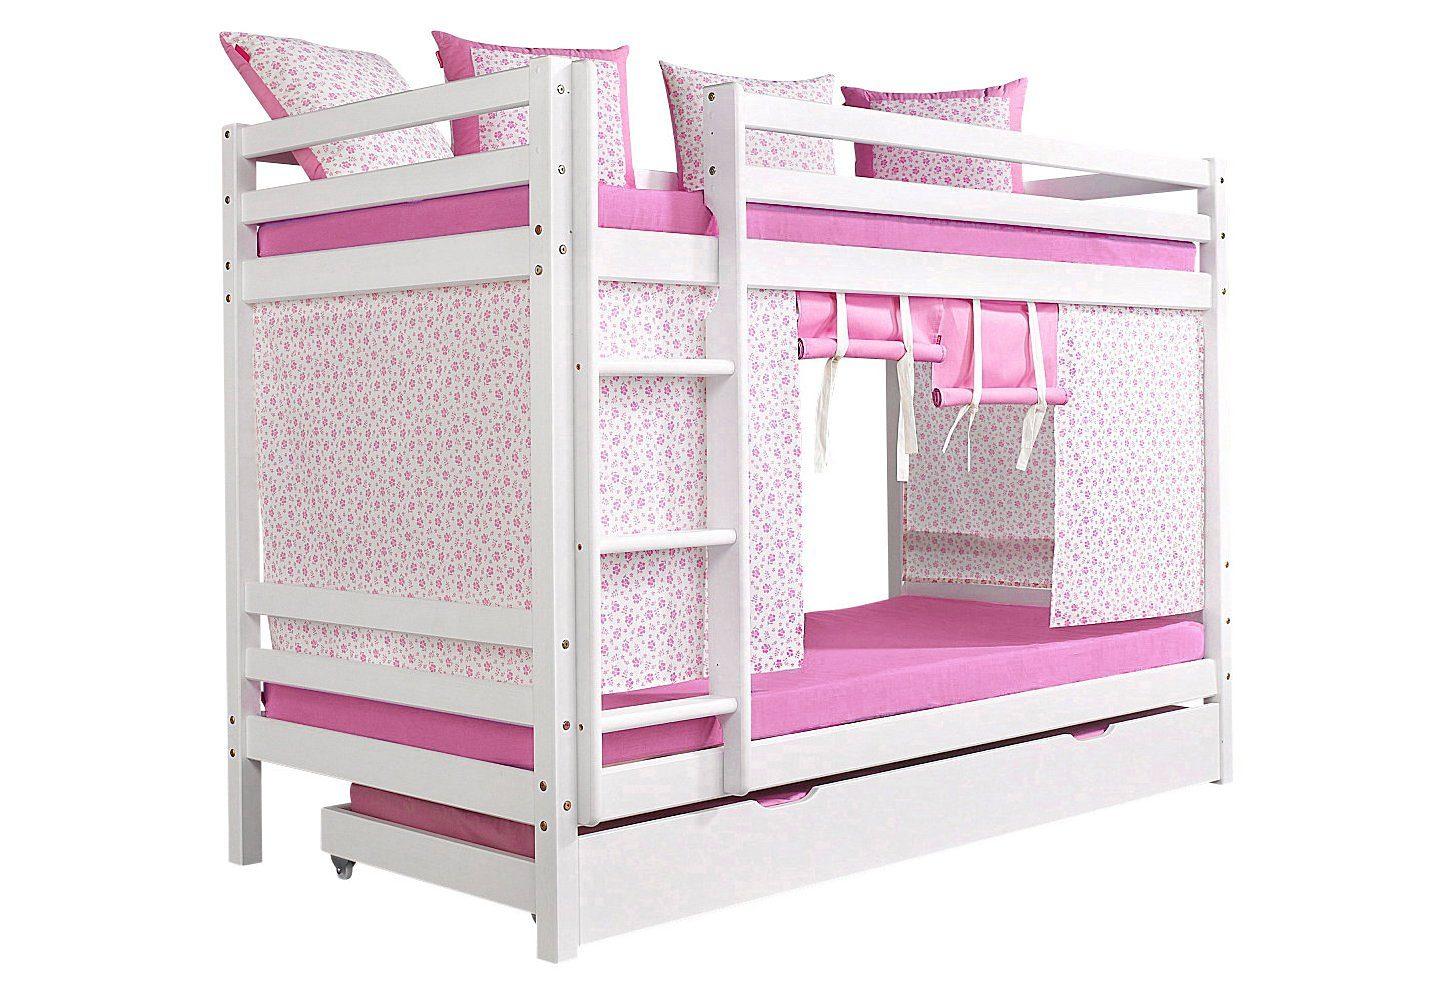 Etagenbett Weiß Metall : Etagenbett doppelstockbett online kaufen stockbett otto